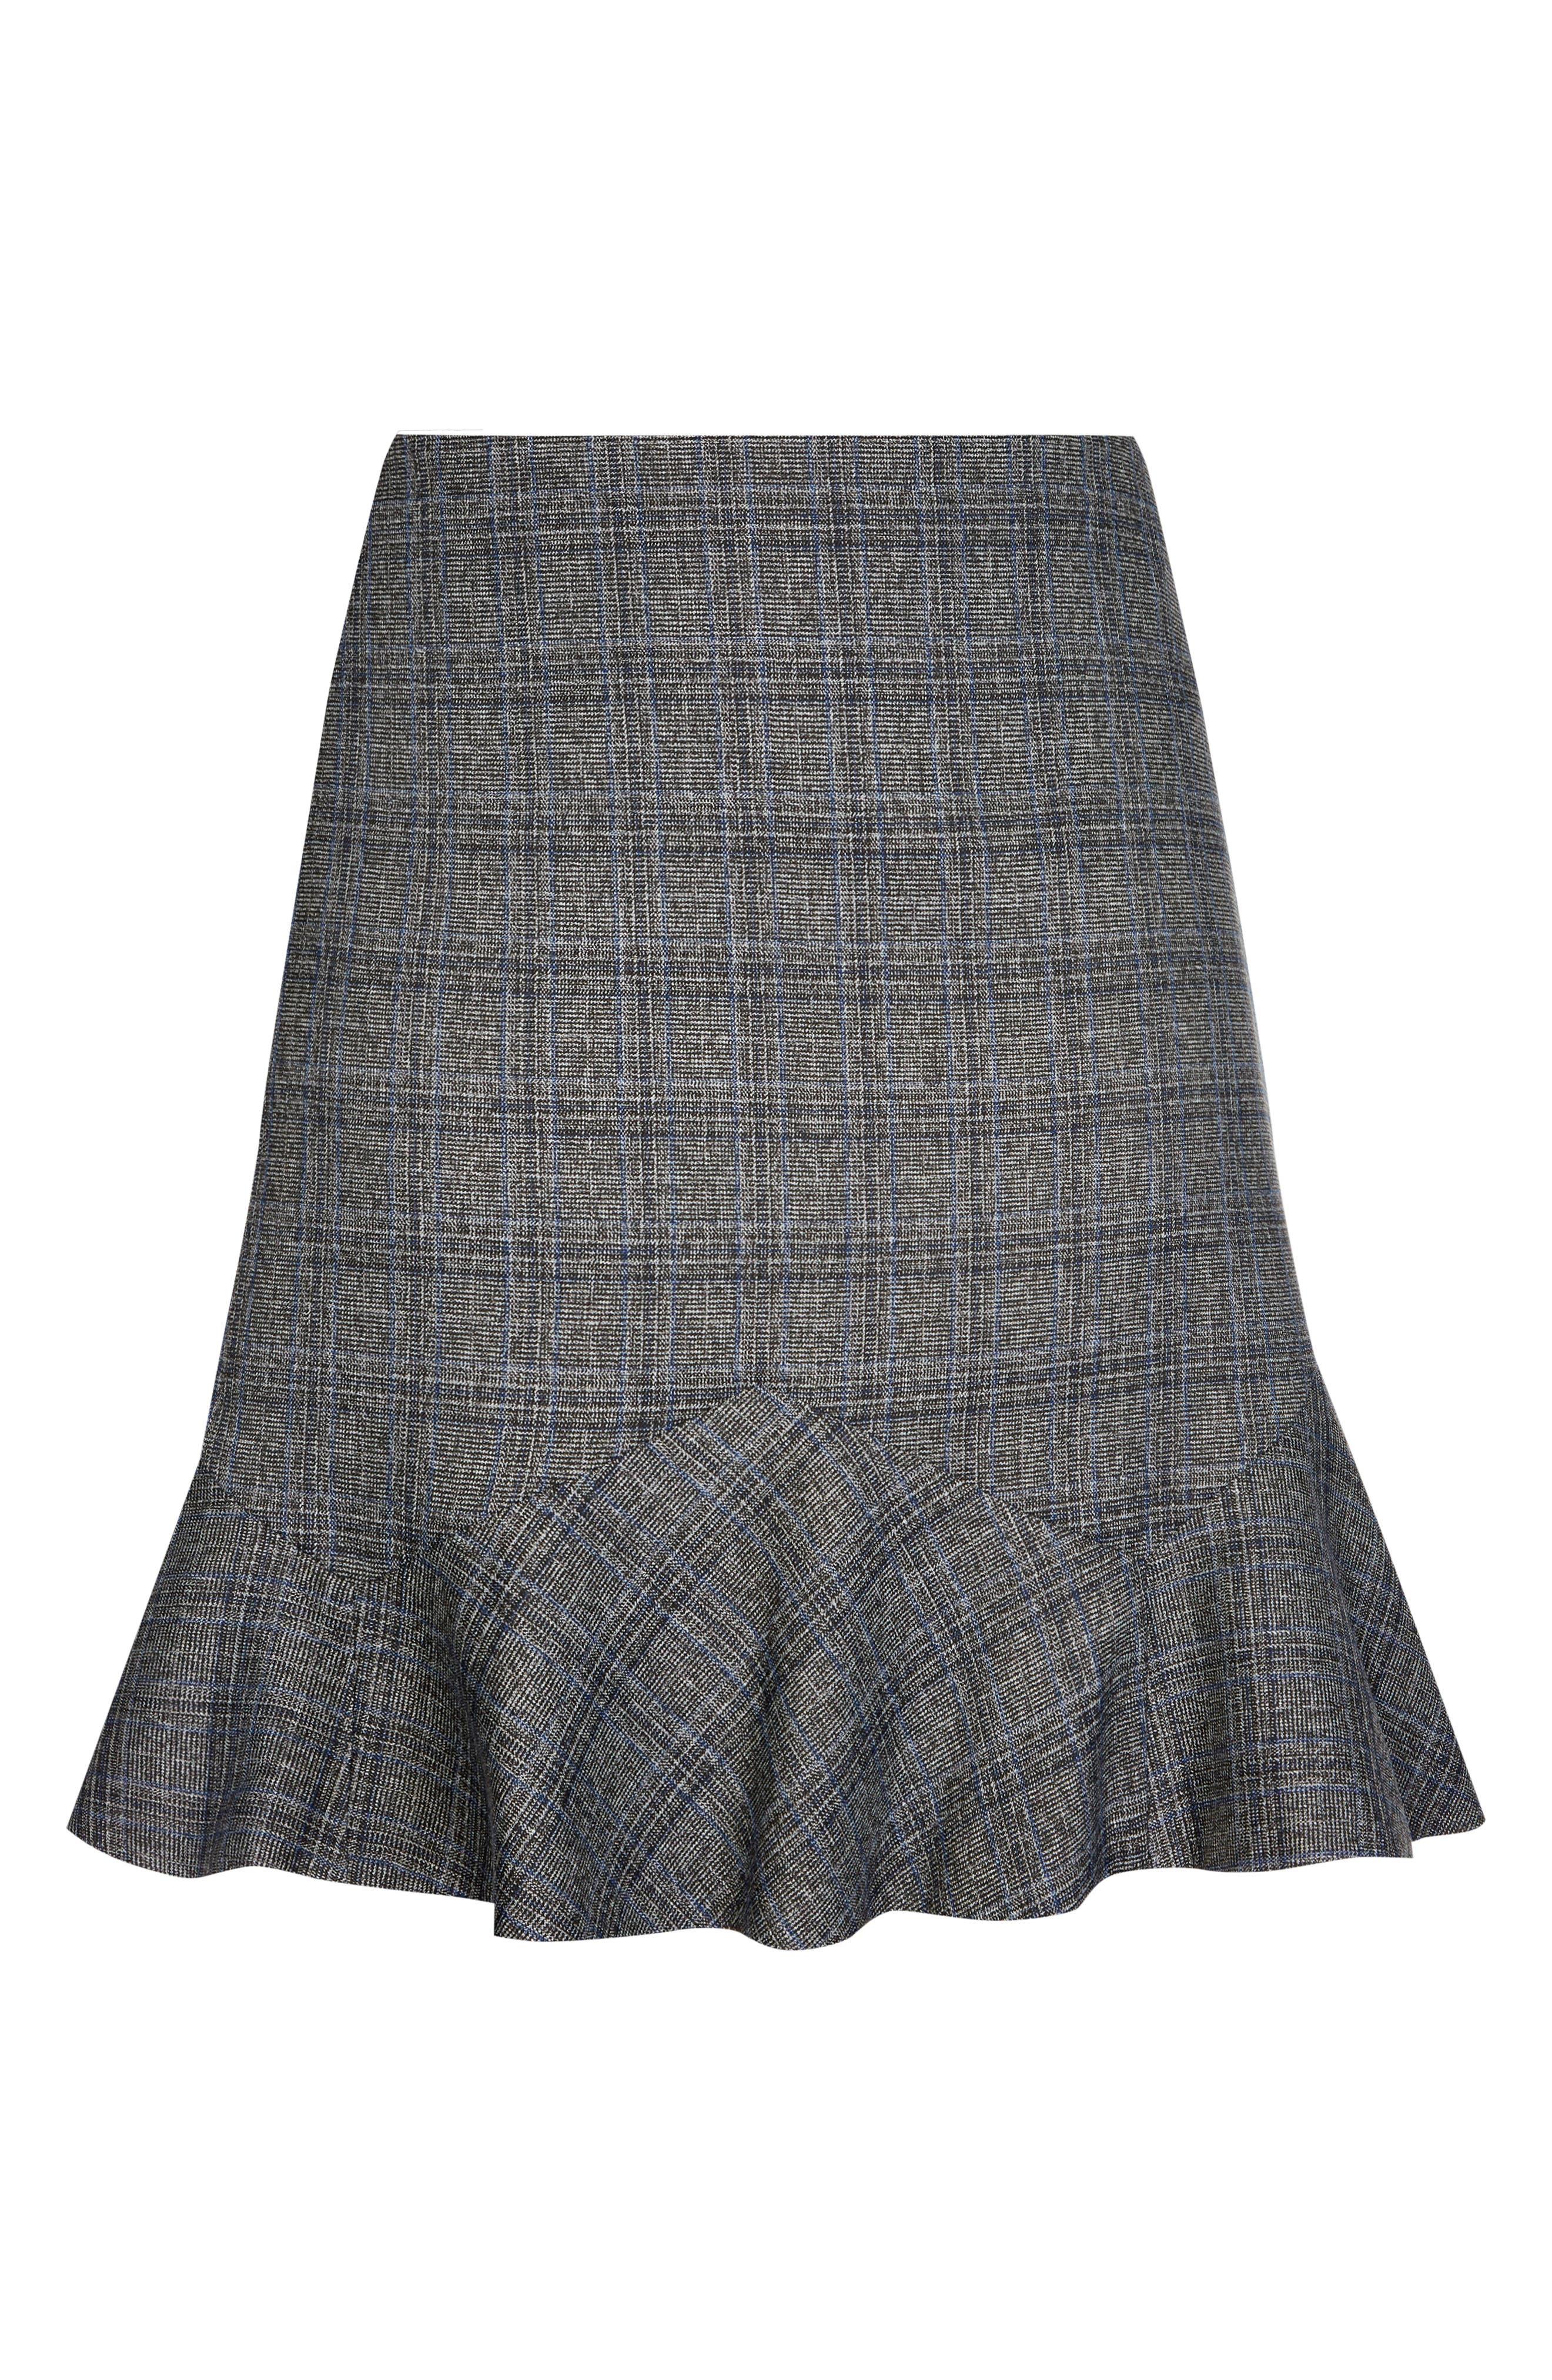 Scottish Plaid Frill Skirt,                             Alternate thumbnail 3, color,                             ELECTRIC CHECK